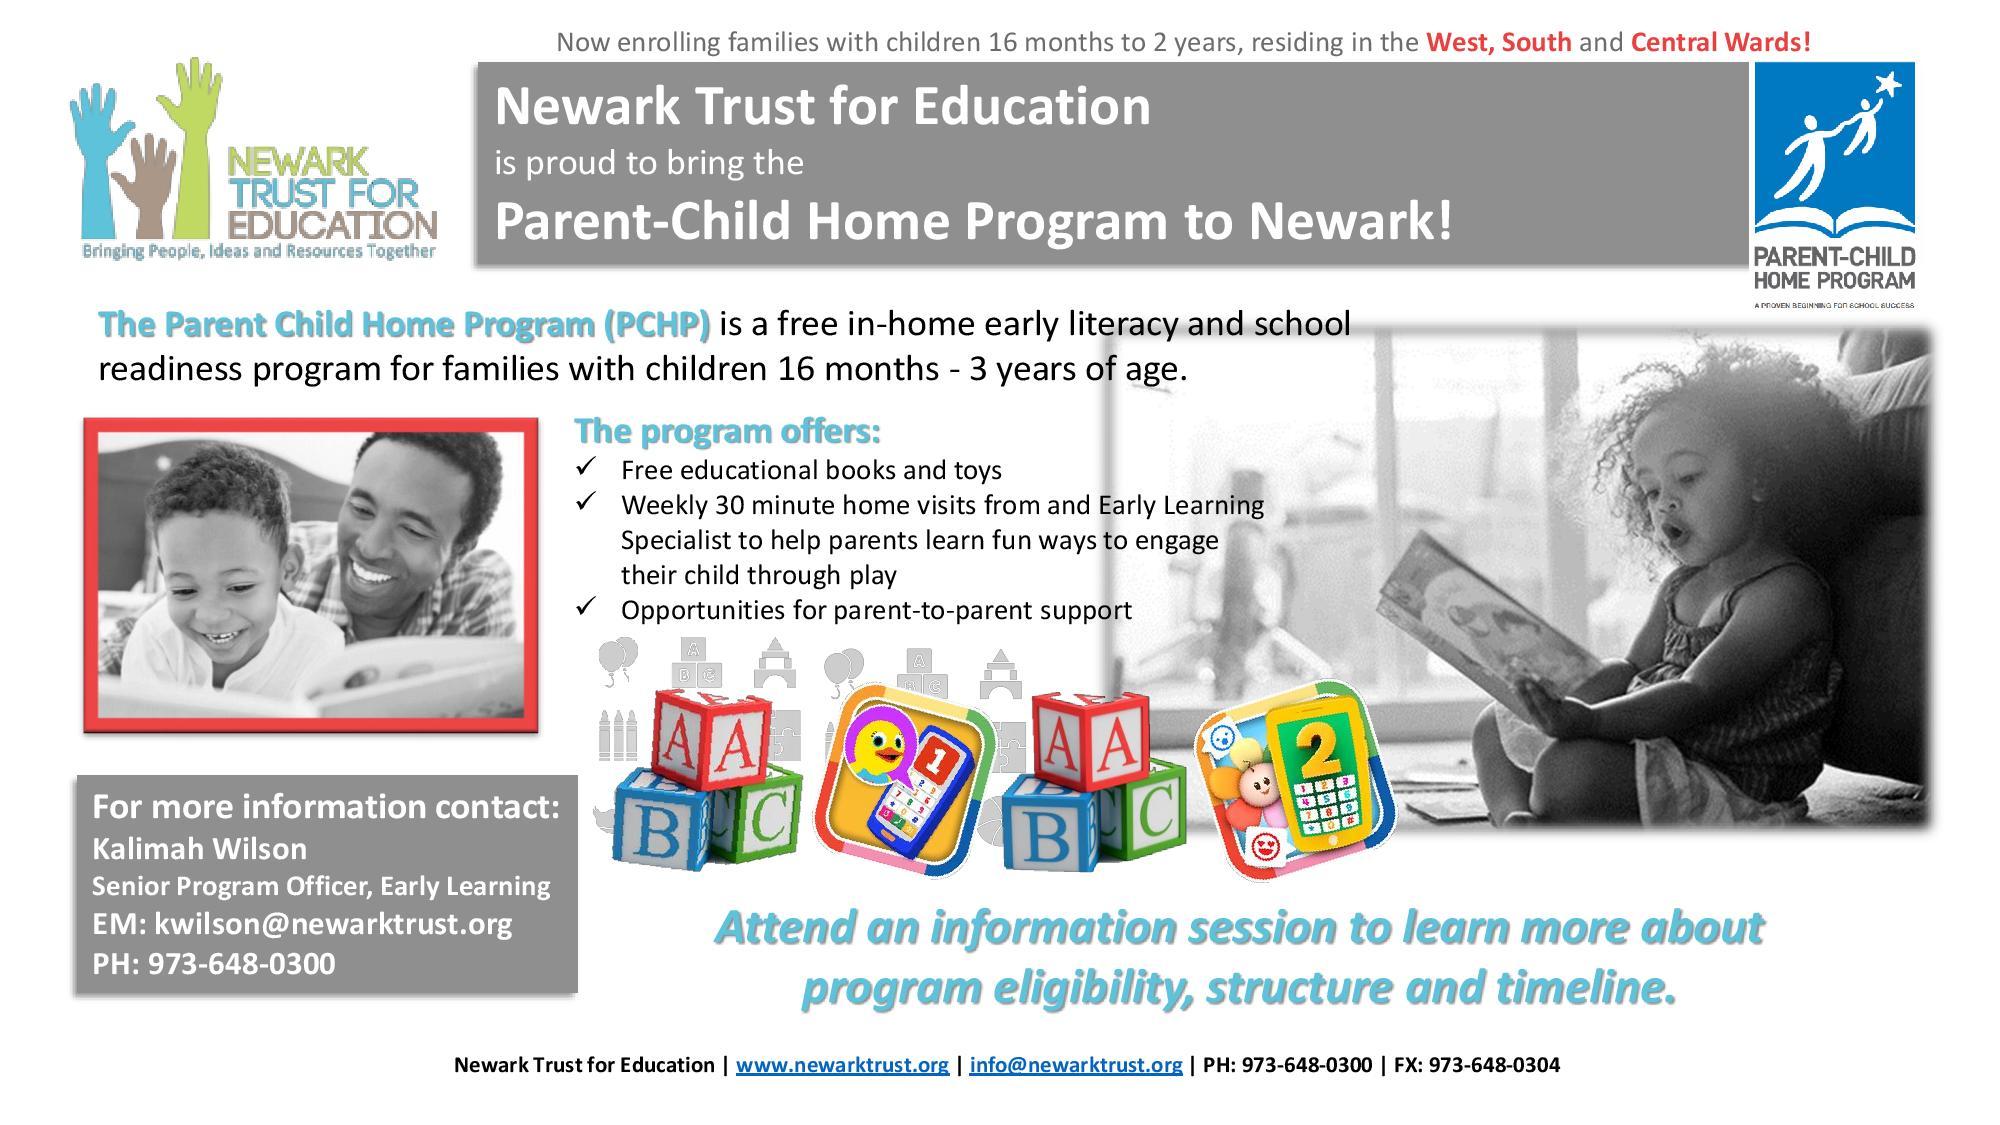 Parent-Child Home Program - The Newark Trust for Education